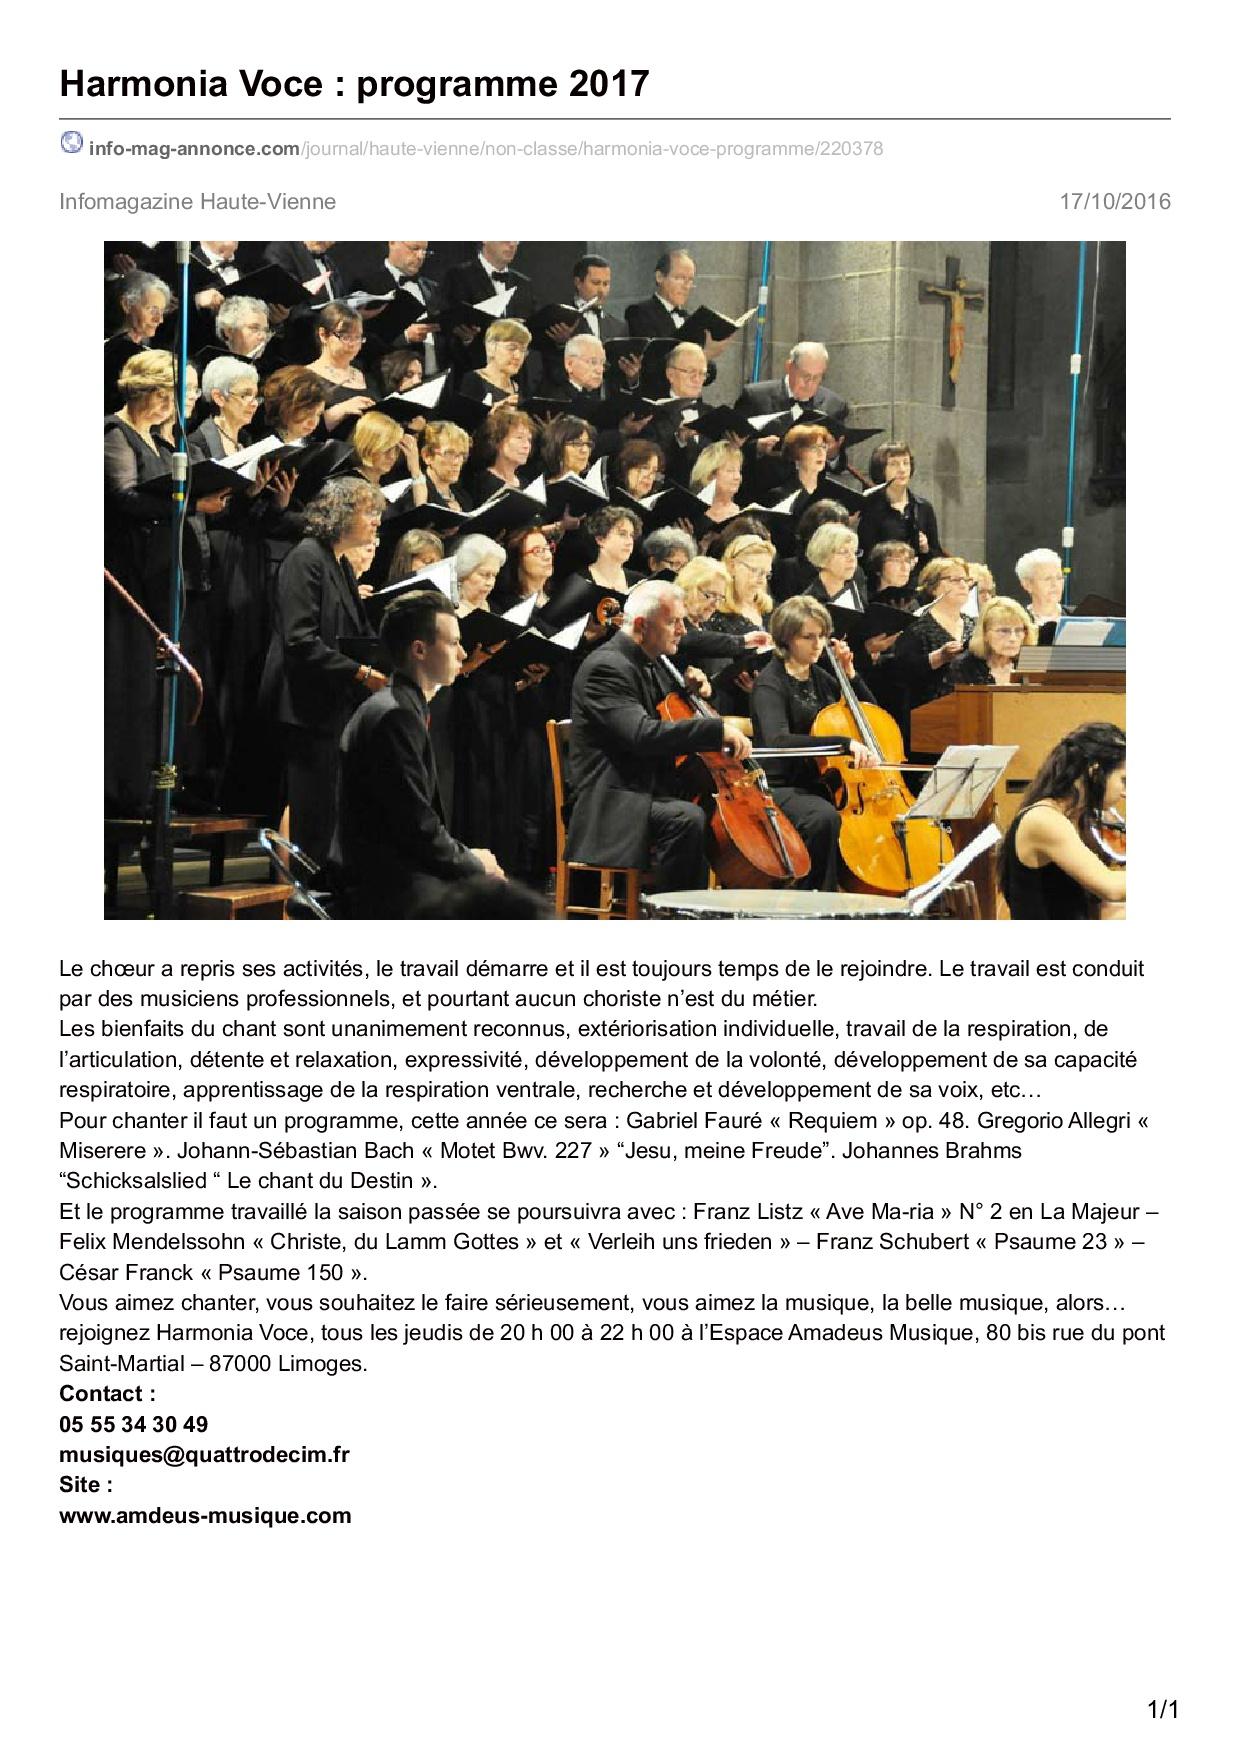 info-mag-annonce-com-harmonia-voce-programme-2017